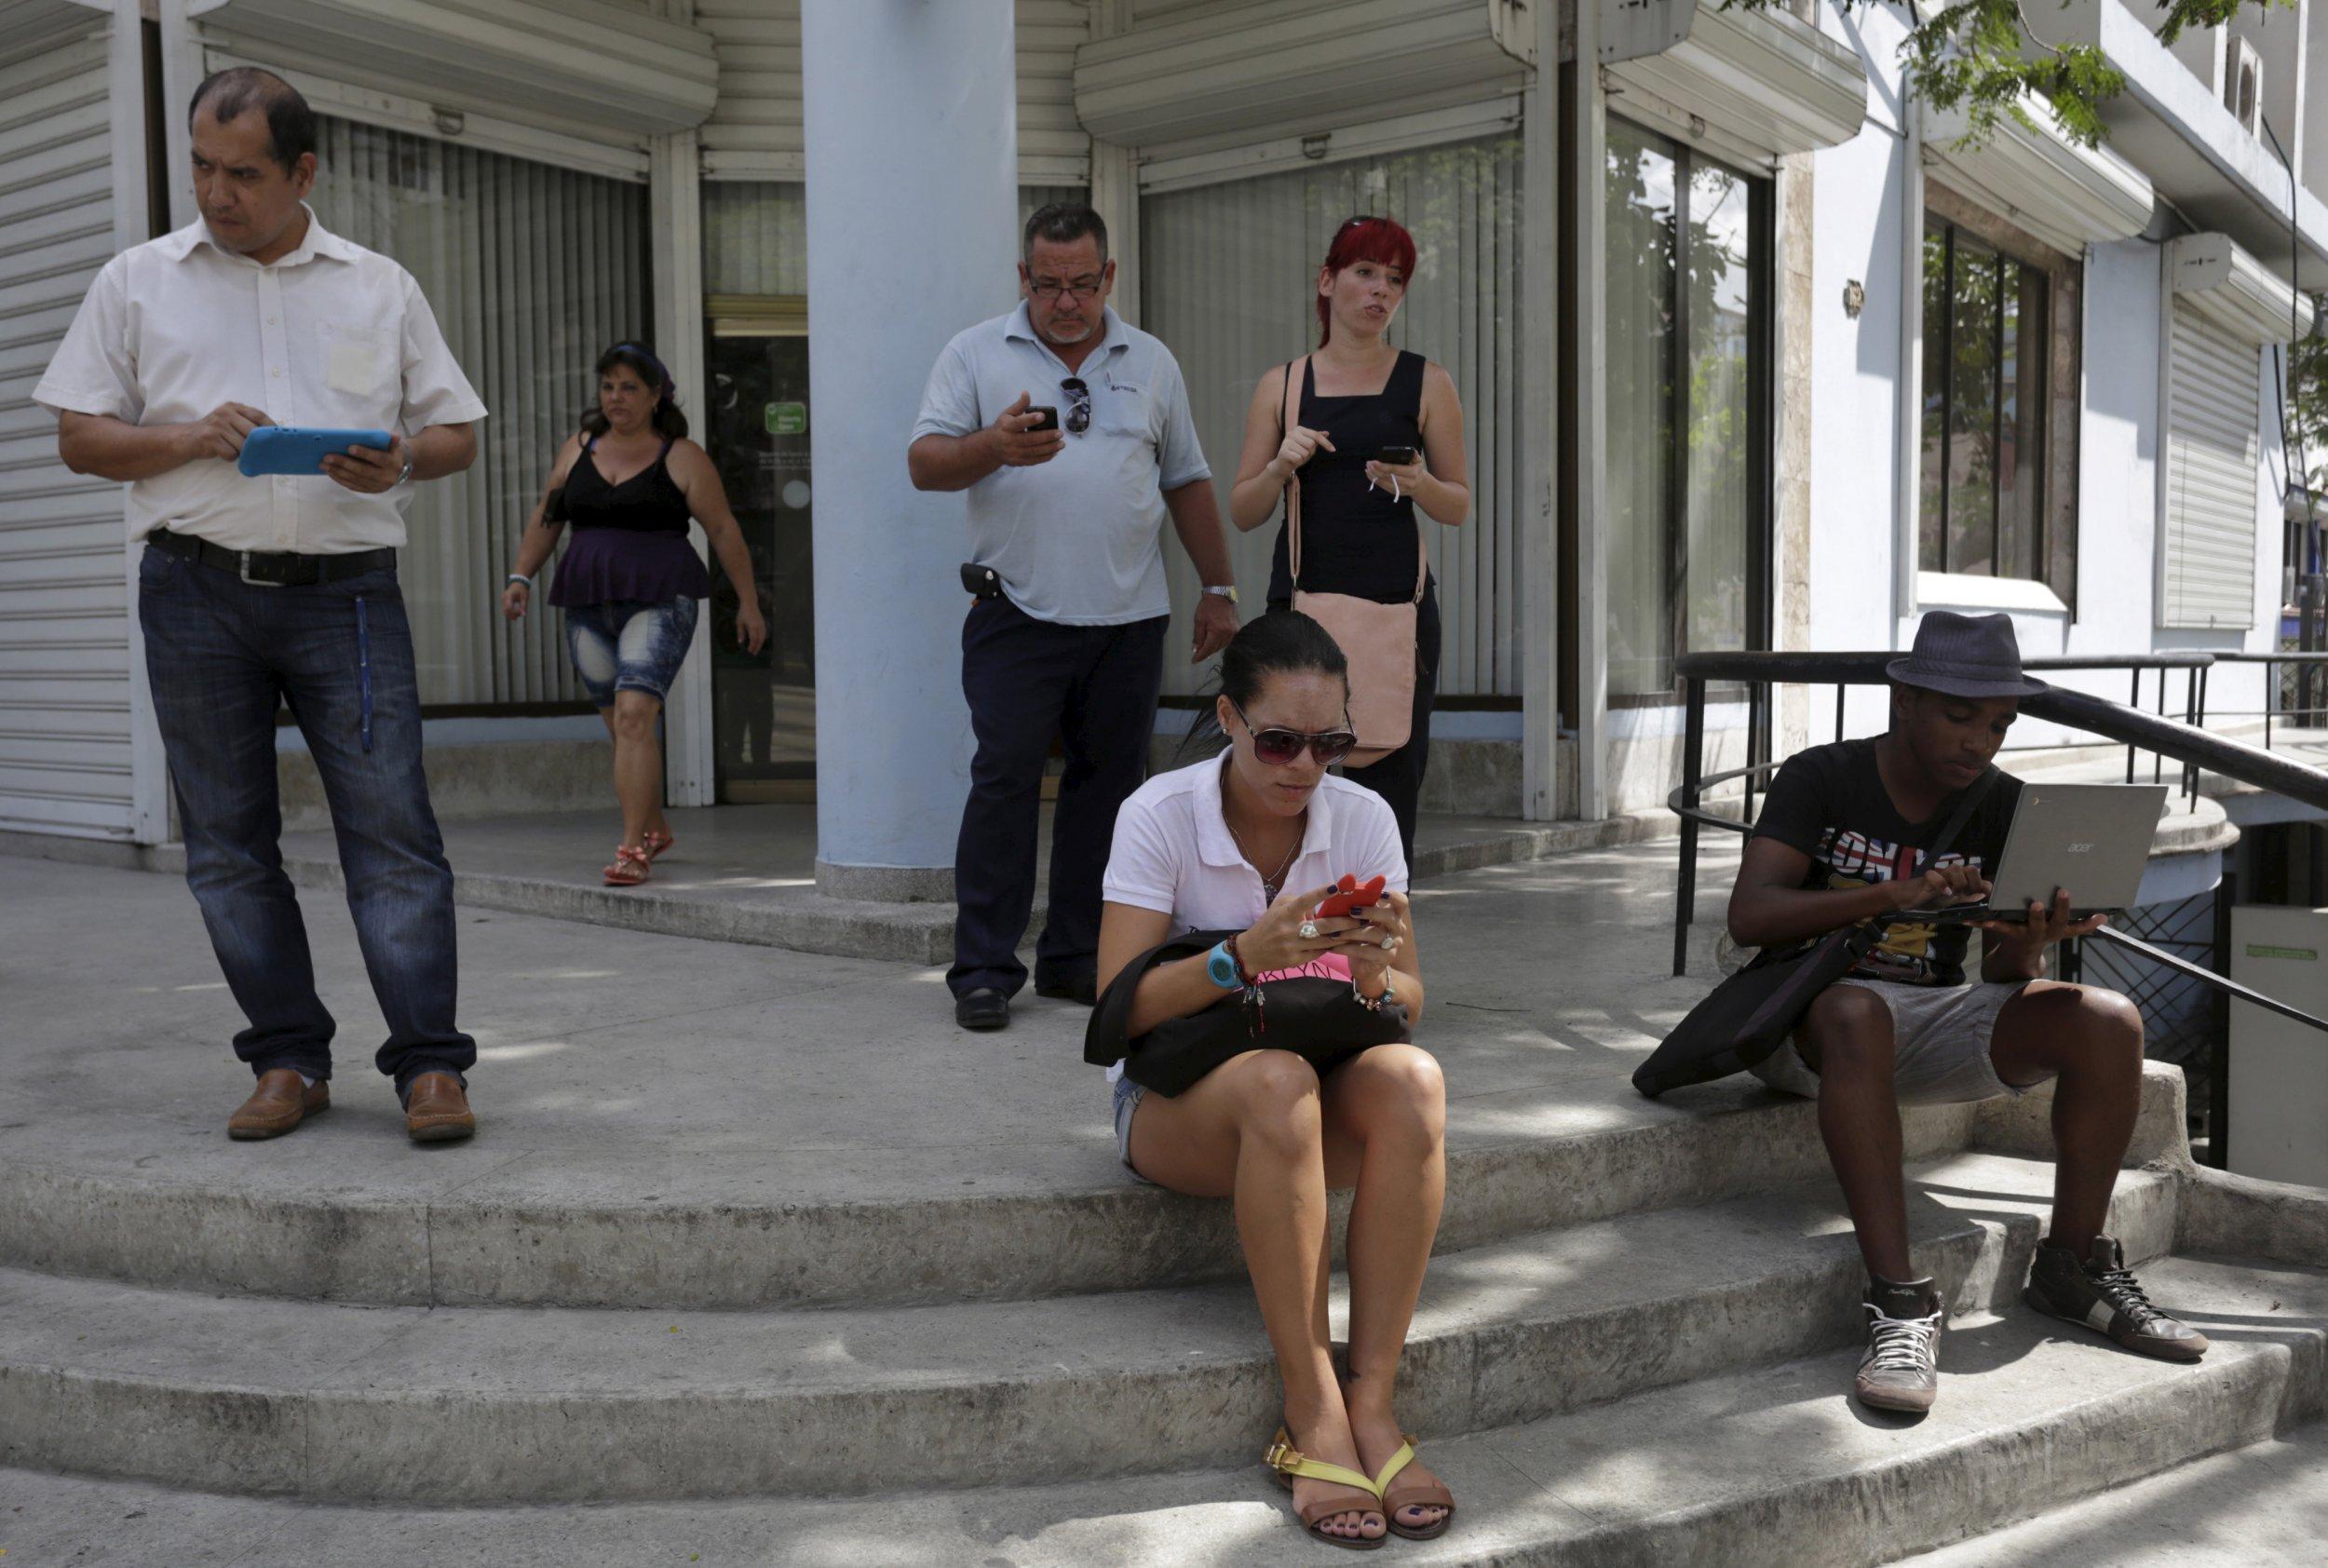 0201_Internet_Cuba_Castro_01